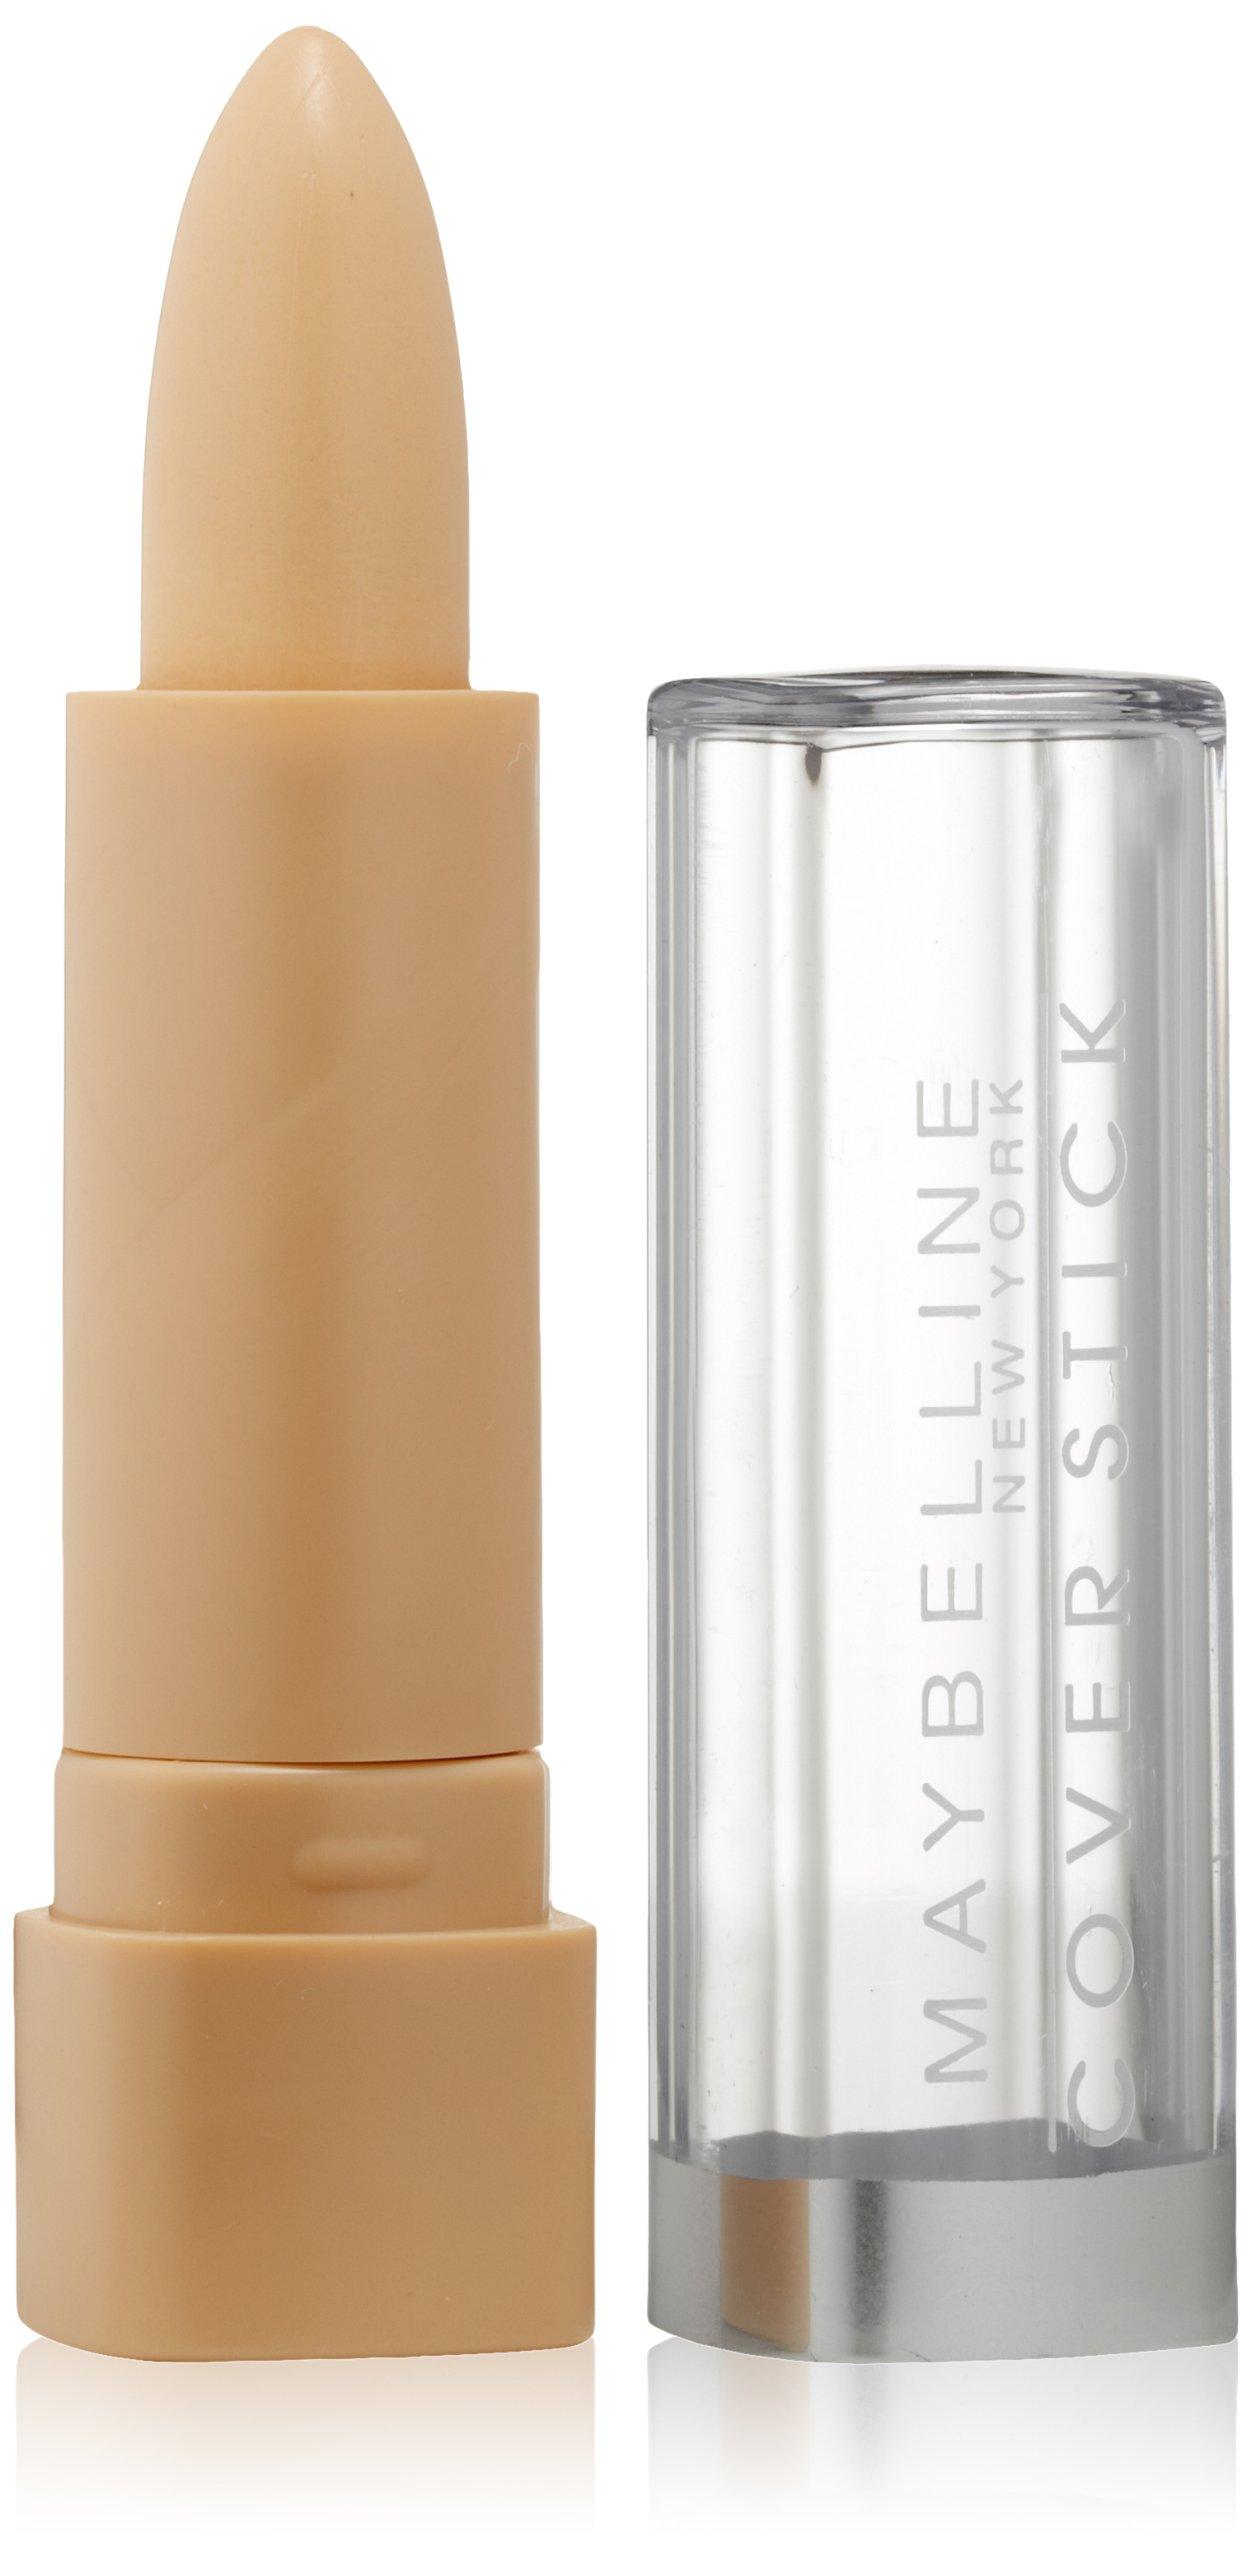 Maybelline New York Cover Stick Concealer, Light Beige, Light 1, 0.16 Ounce